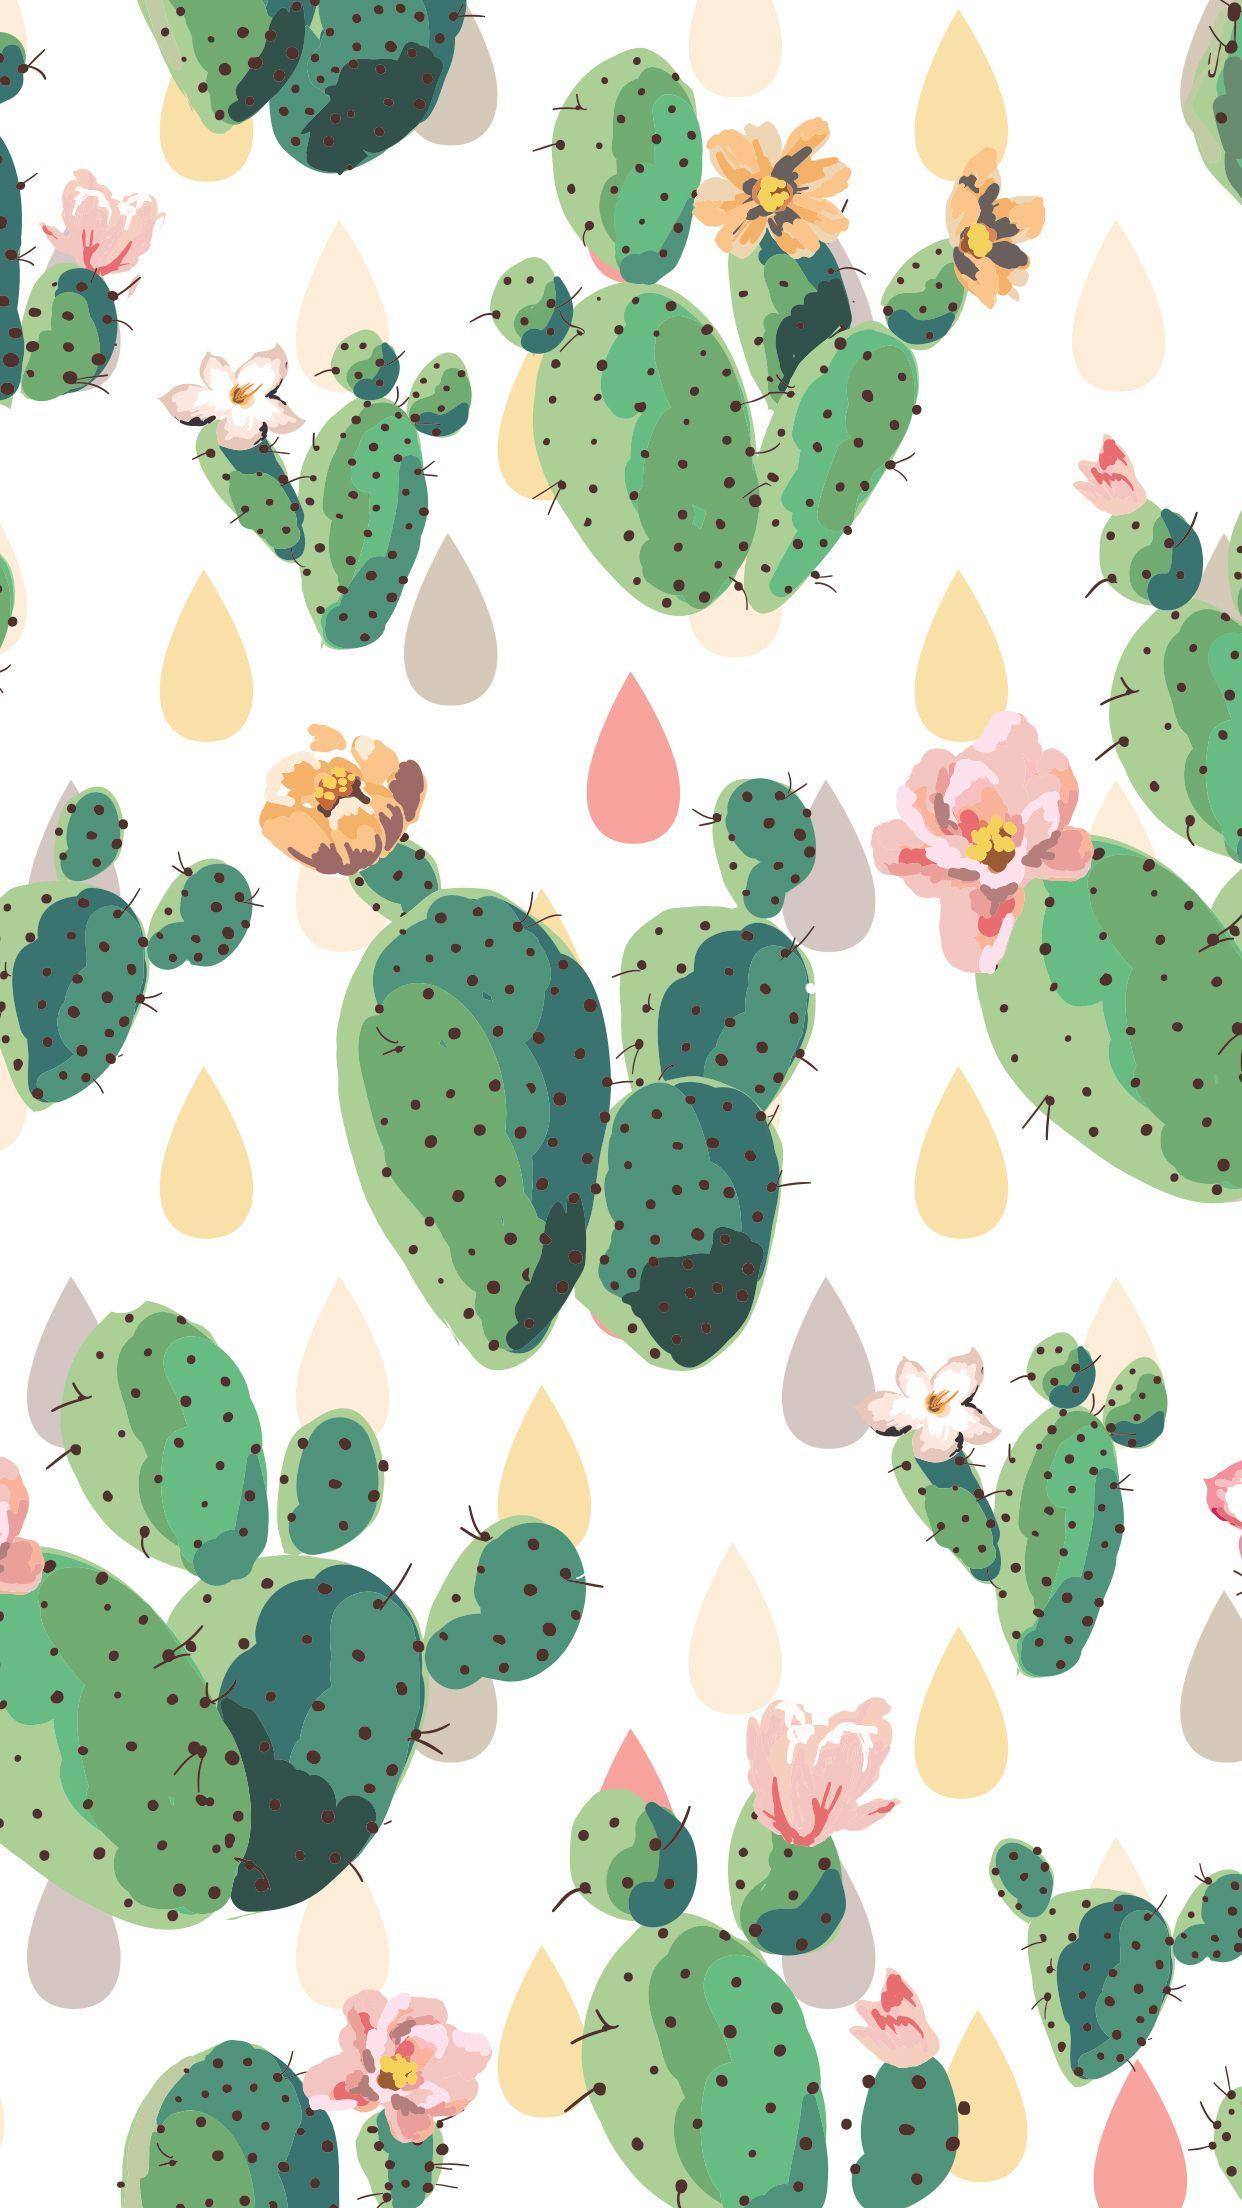 Aesthetic Cactus Iphone Wallpaper Novocom Top